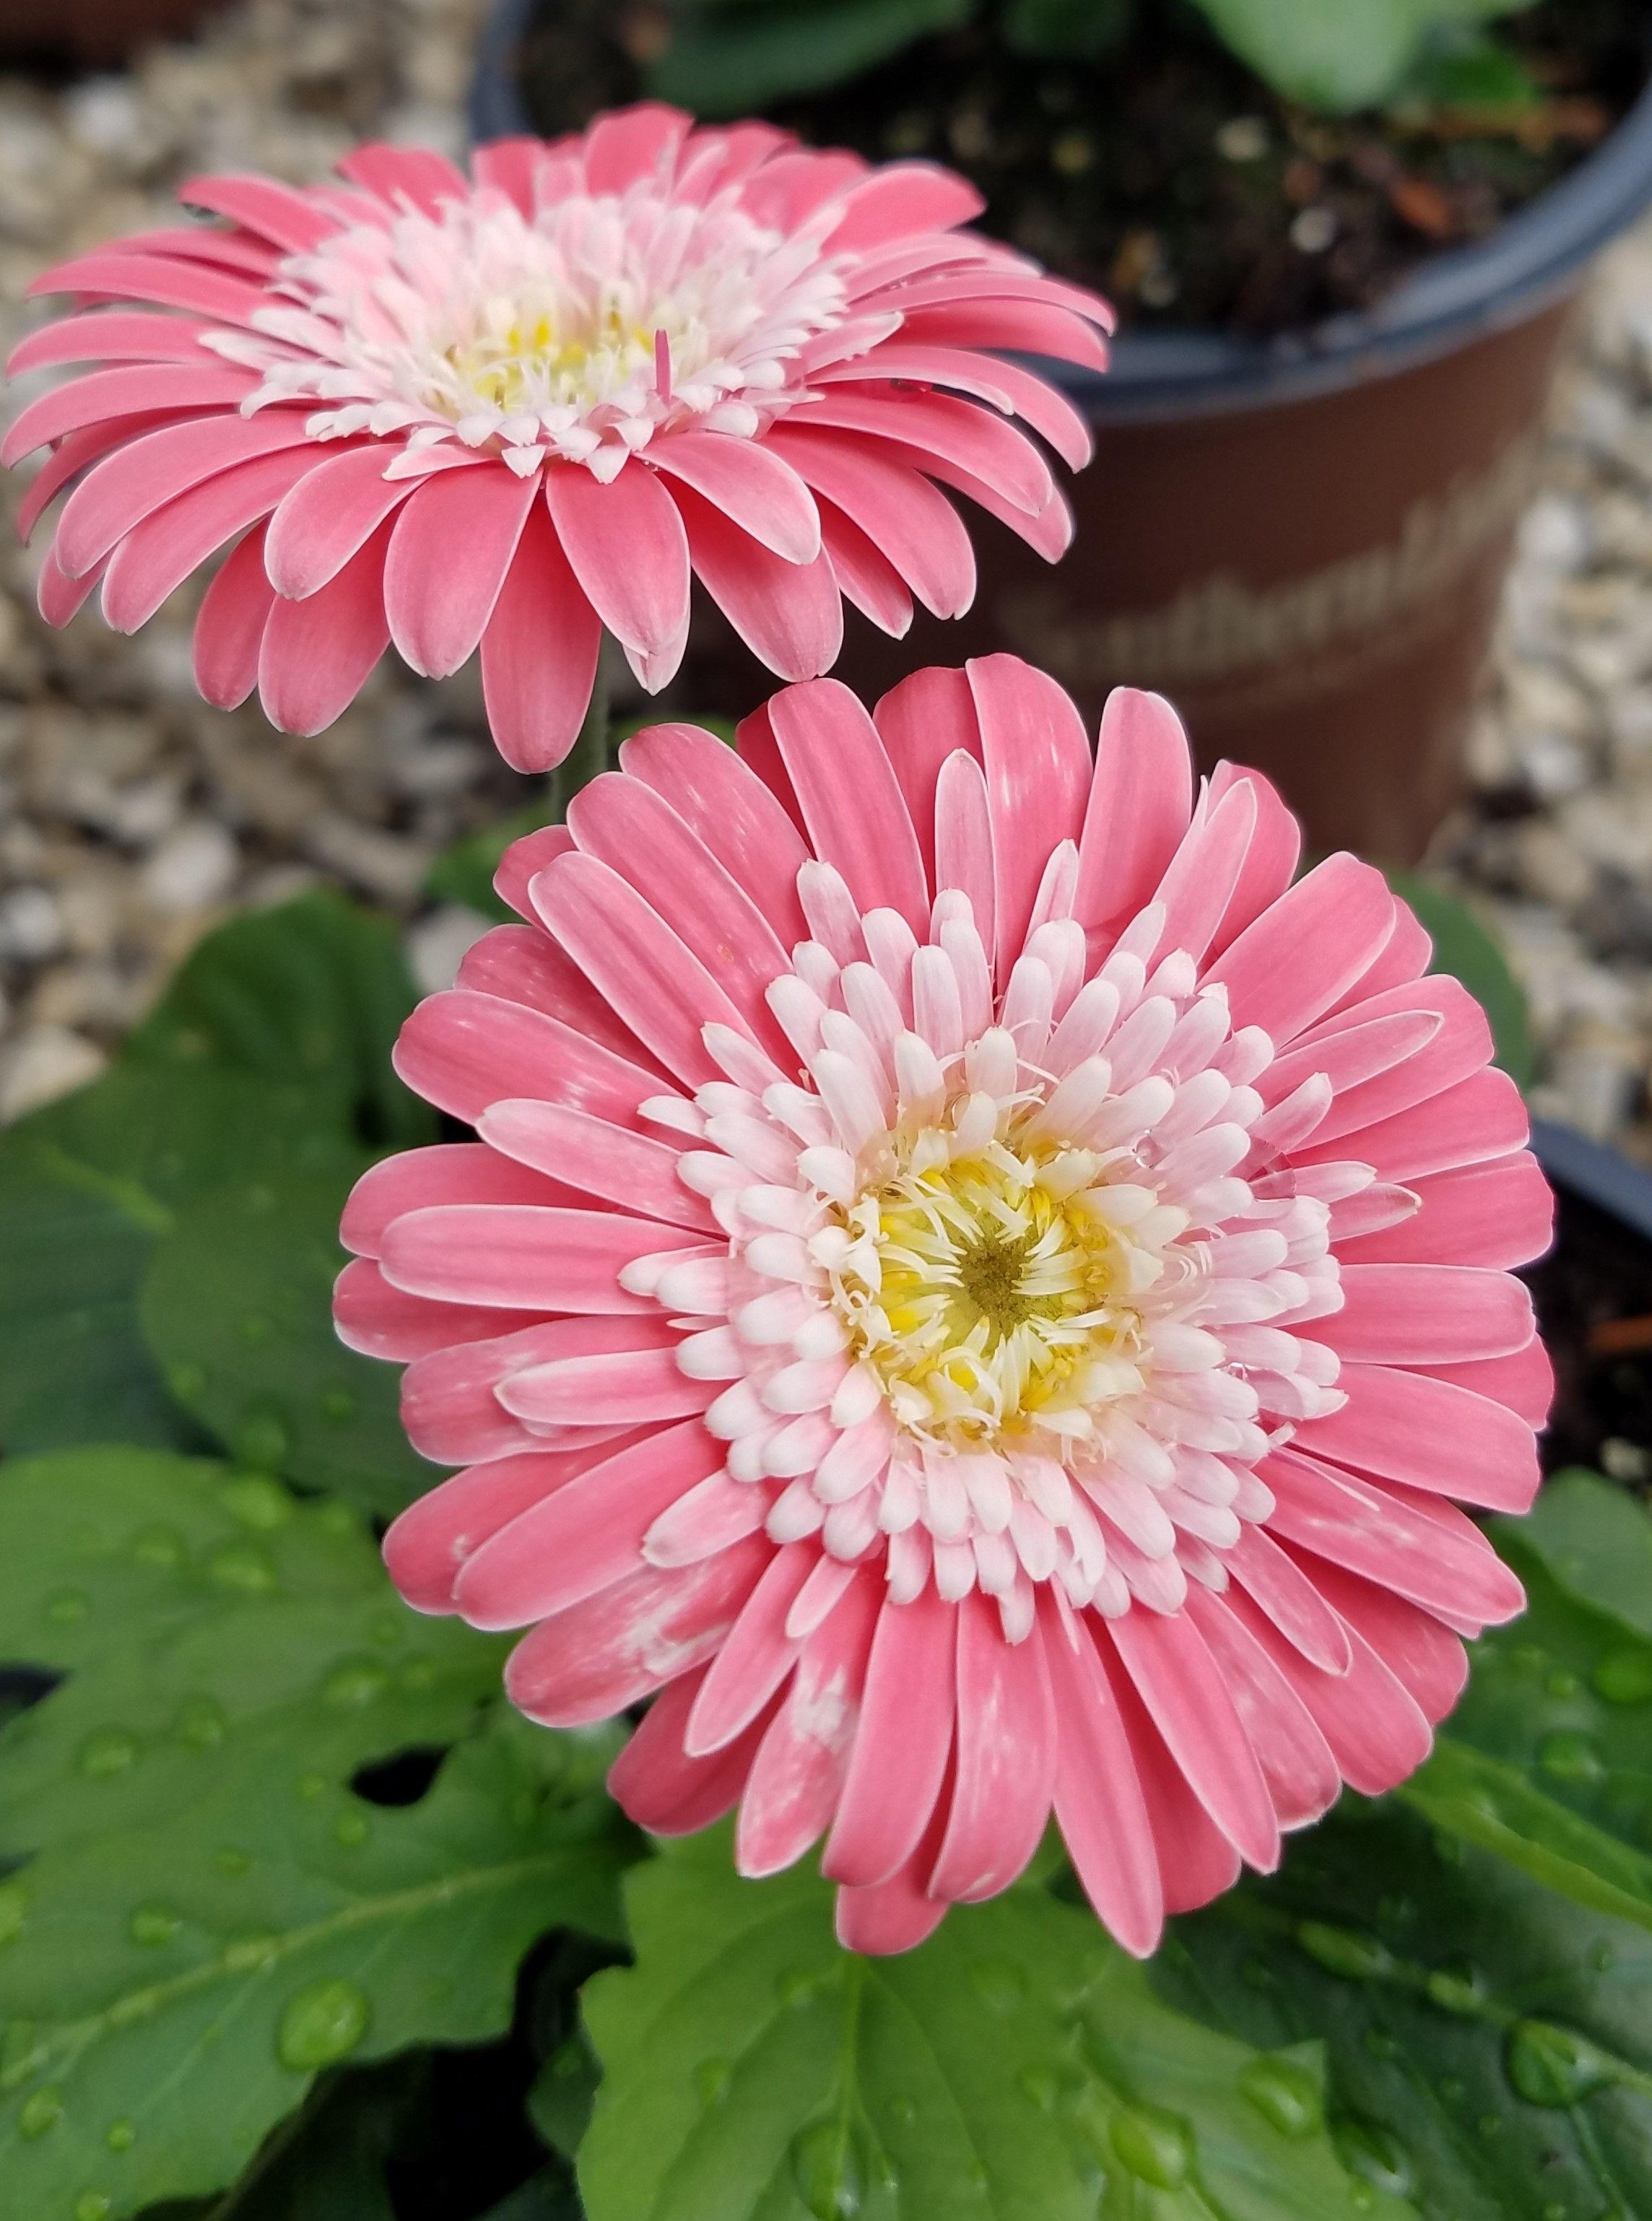 Pink Garden Jewels Gerbera Daisy Shop With Plantsbymail Com Gerbera Daisy Pink Garden Gerbera